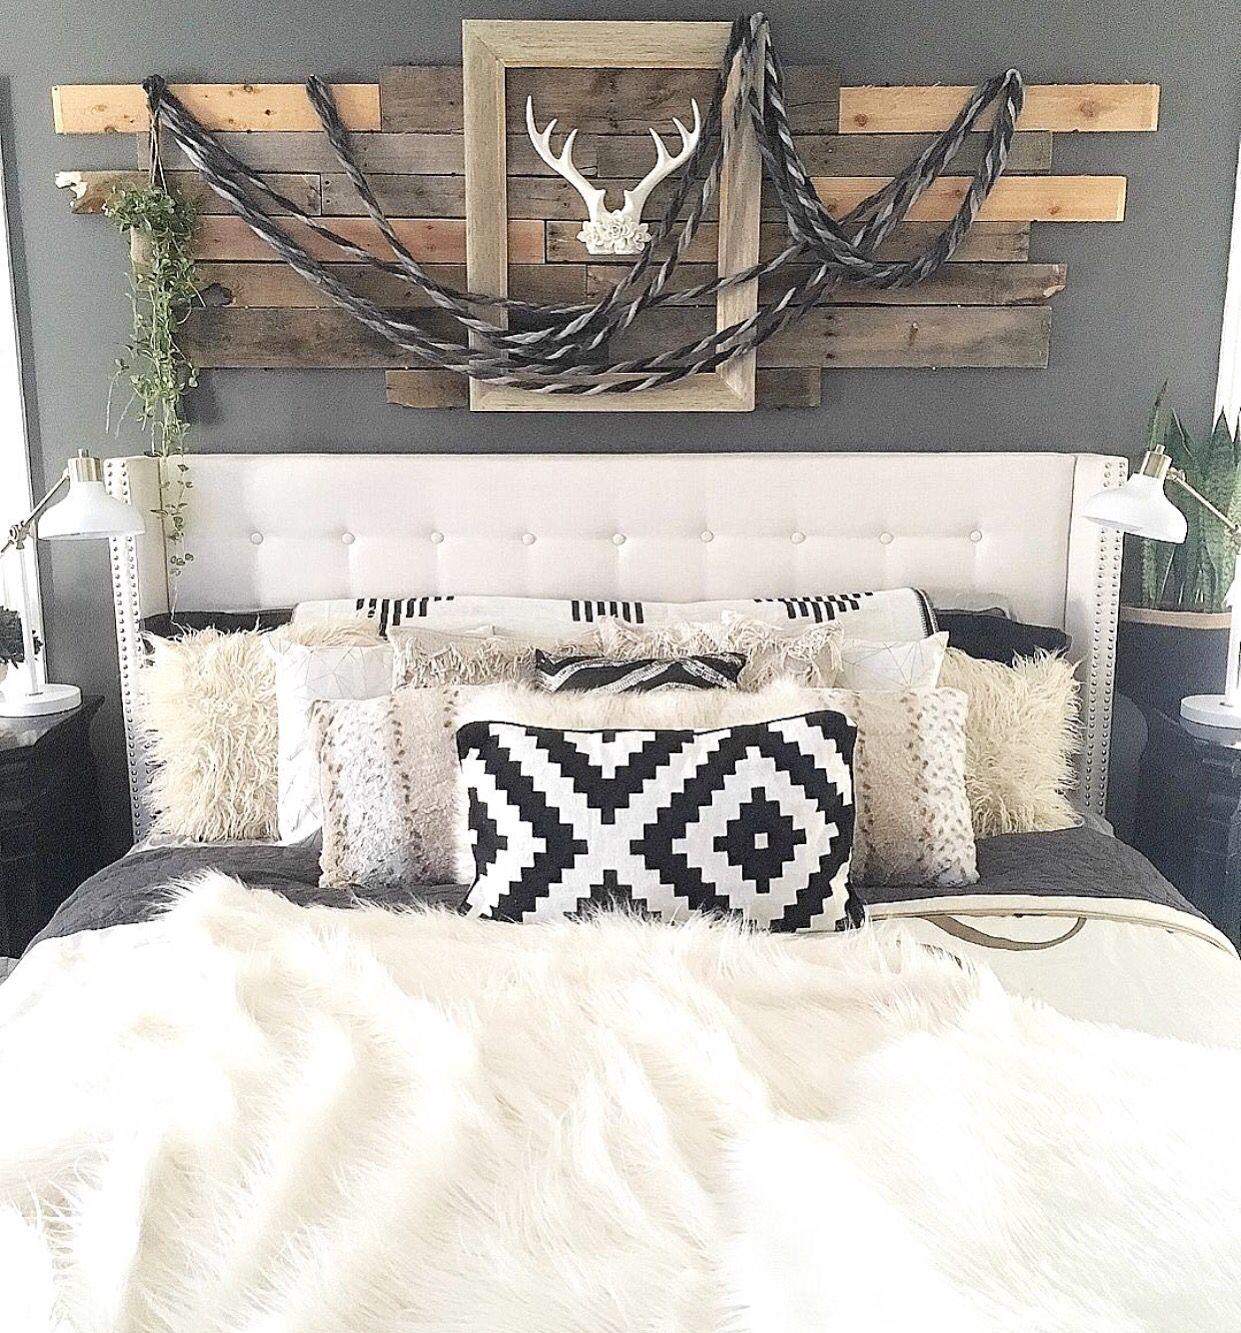 Rustic Boho Chic Master Bedroom